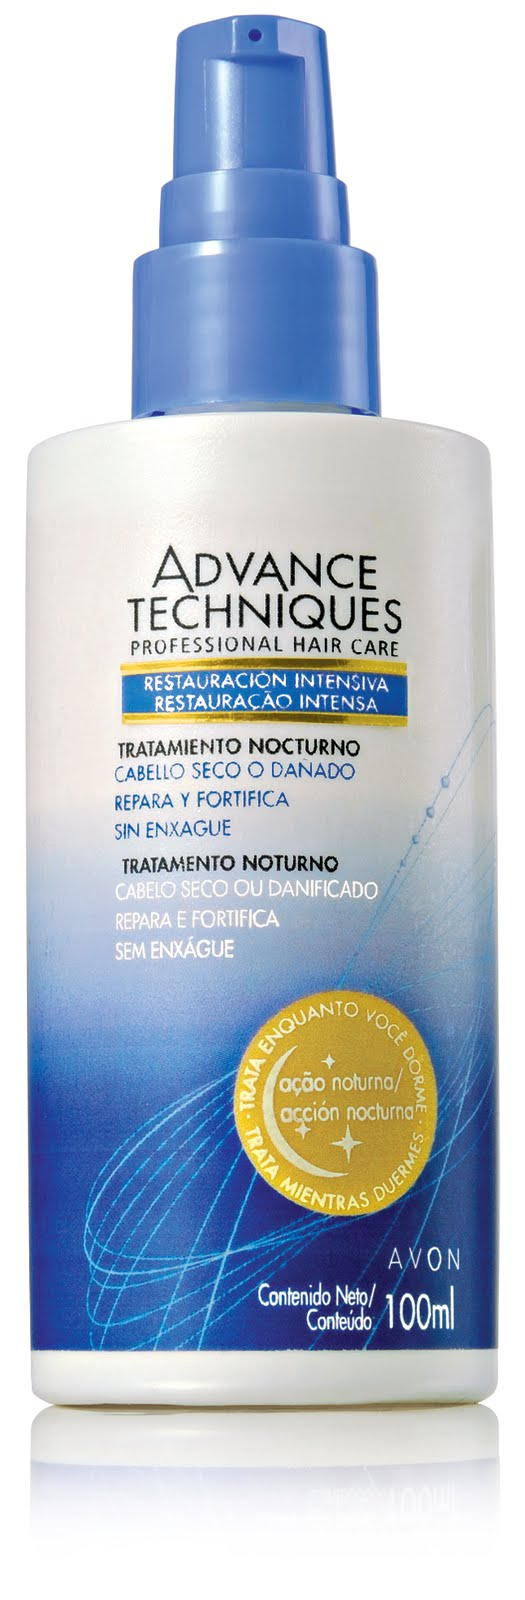 http://3.bp.blogspot.com/_m-njC55U4kw/S8YbzBLSRKI/AAAAAAAABC8/a1_iIo69N5A/s1600/Advance+Tecniques+Restaura%C3%A7%C3%A3o+Intensa+Tratamento+Noturno.jpg